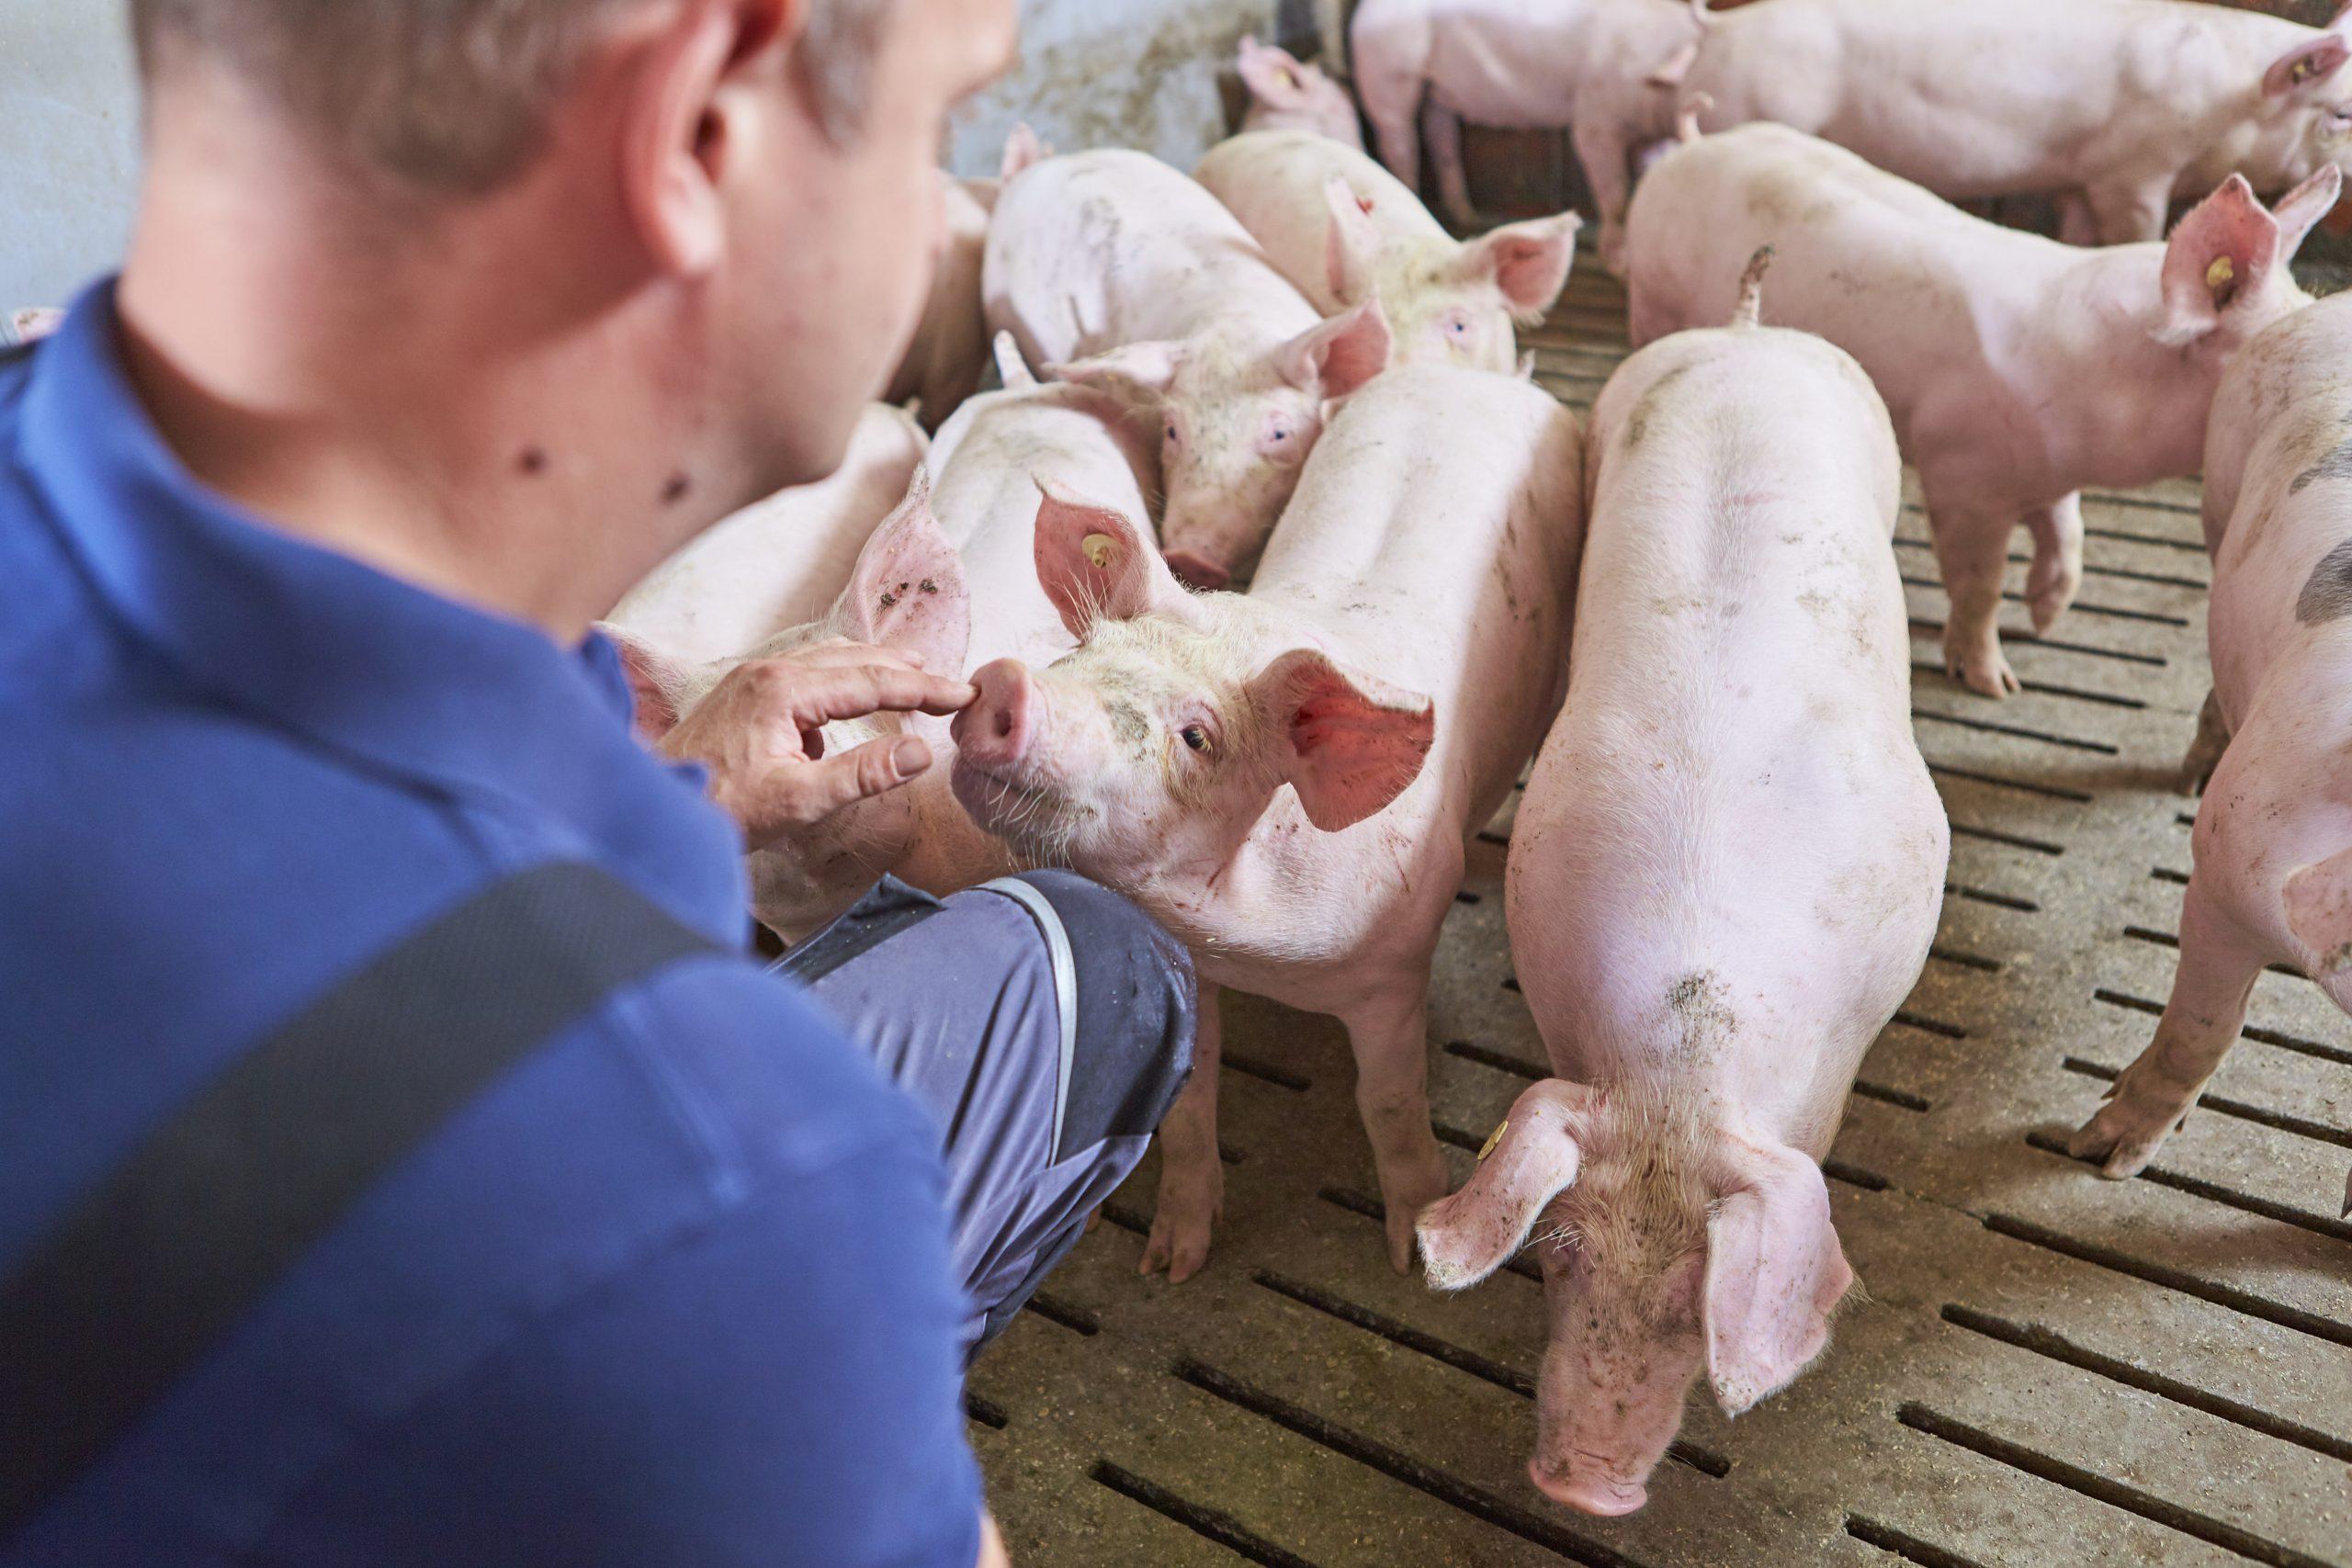 Landestierarzt mahnt ASP-Biosicherheits- maßnahmen für Landwirtschafts- betriebe an